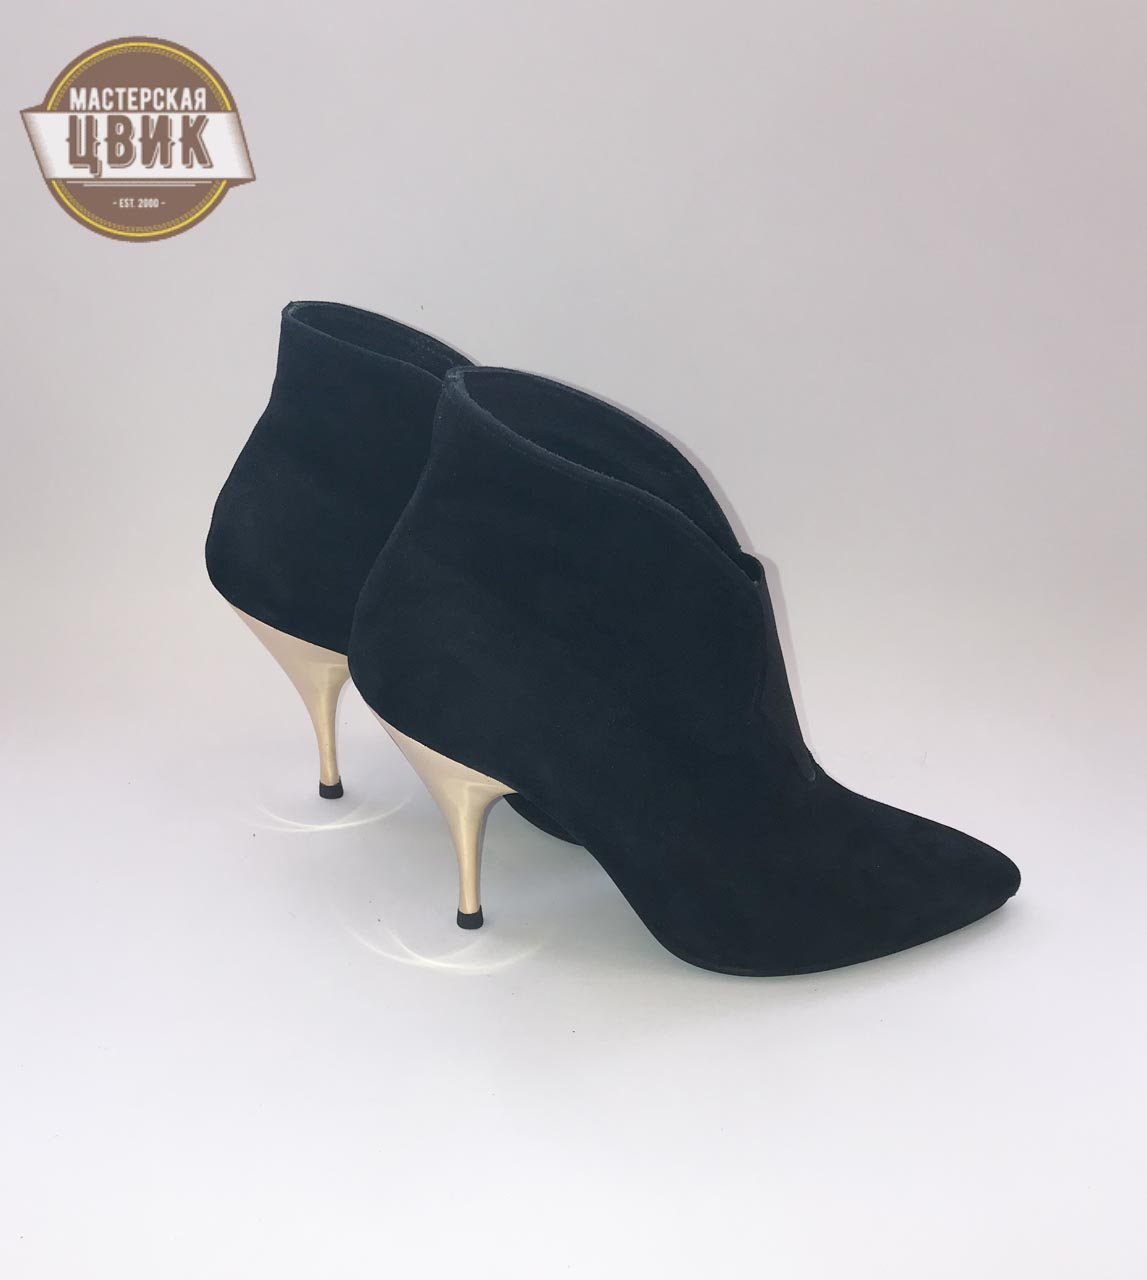 individualnyj-poshiv-obuvi-minsk-44 Индивидуальный пошив обуви